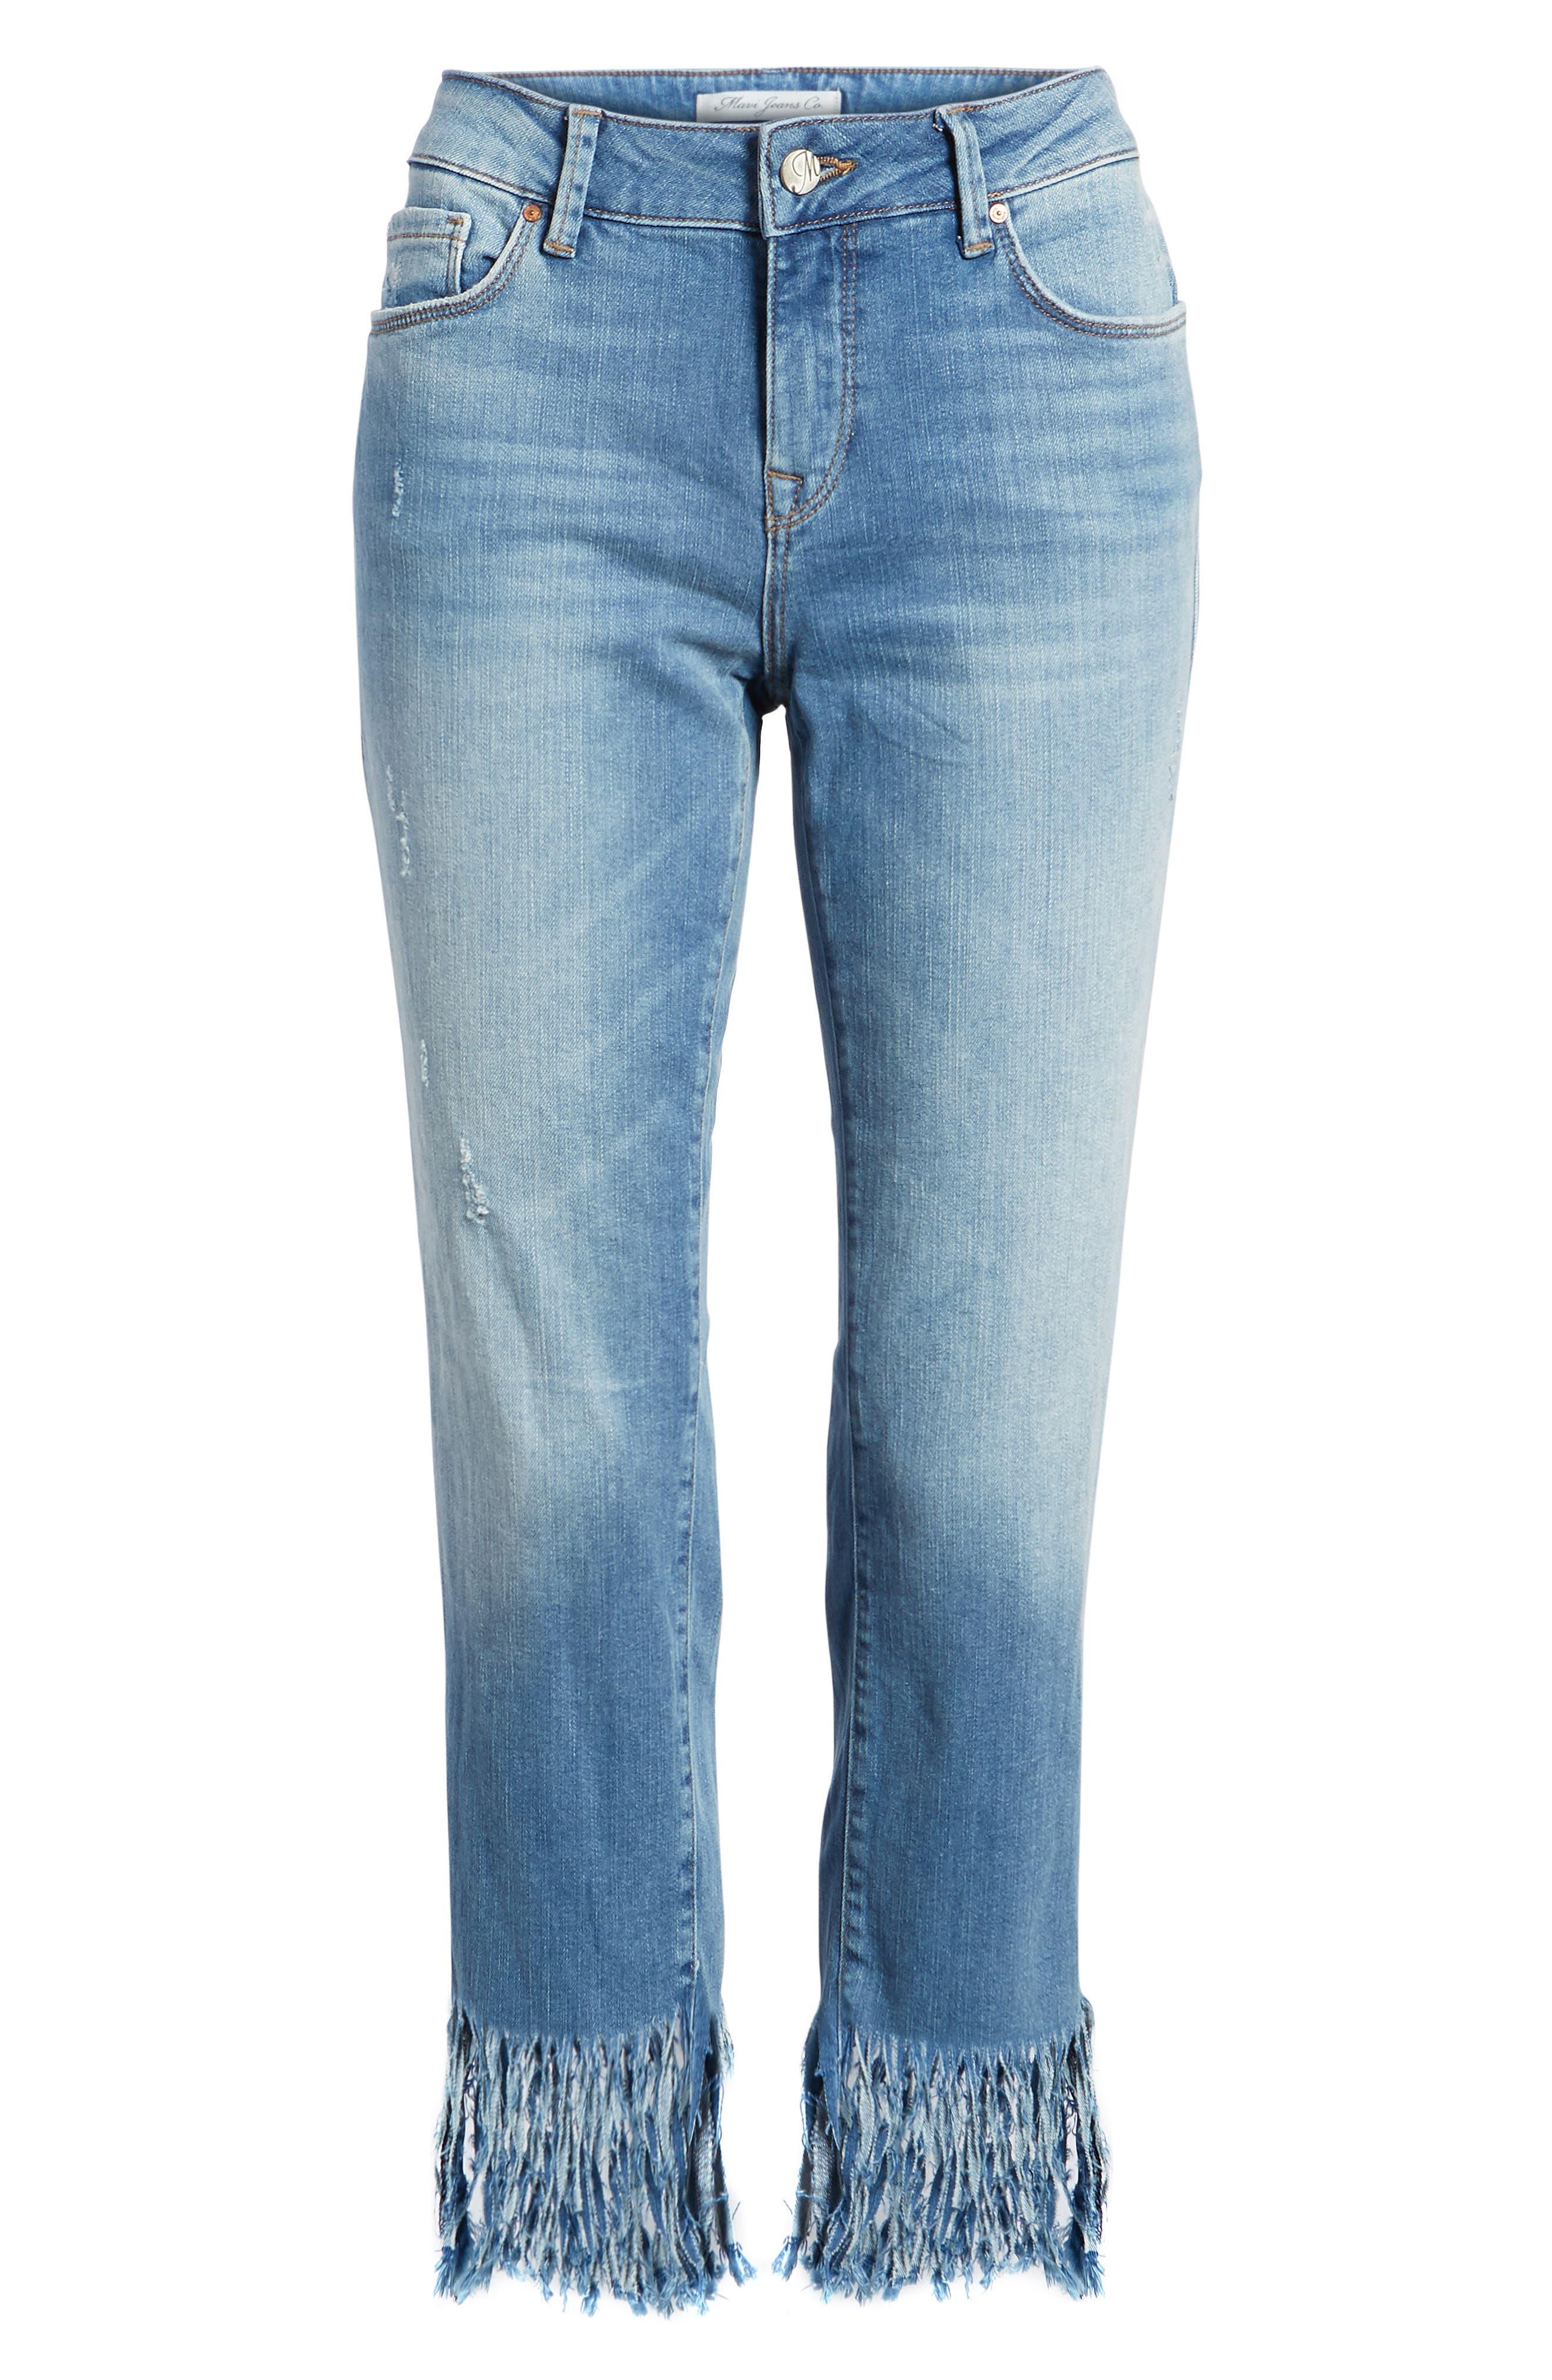 Kerry Fringe Hem Ankle Jeans,                             Alternate thumbnail 7, color,                             Distressed Vintage